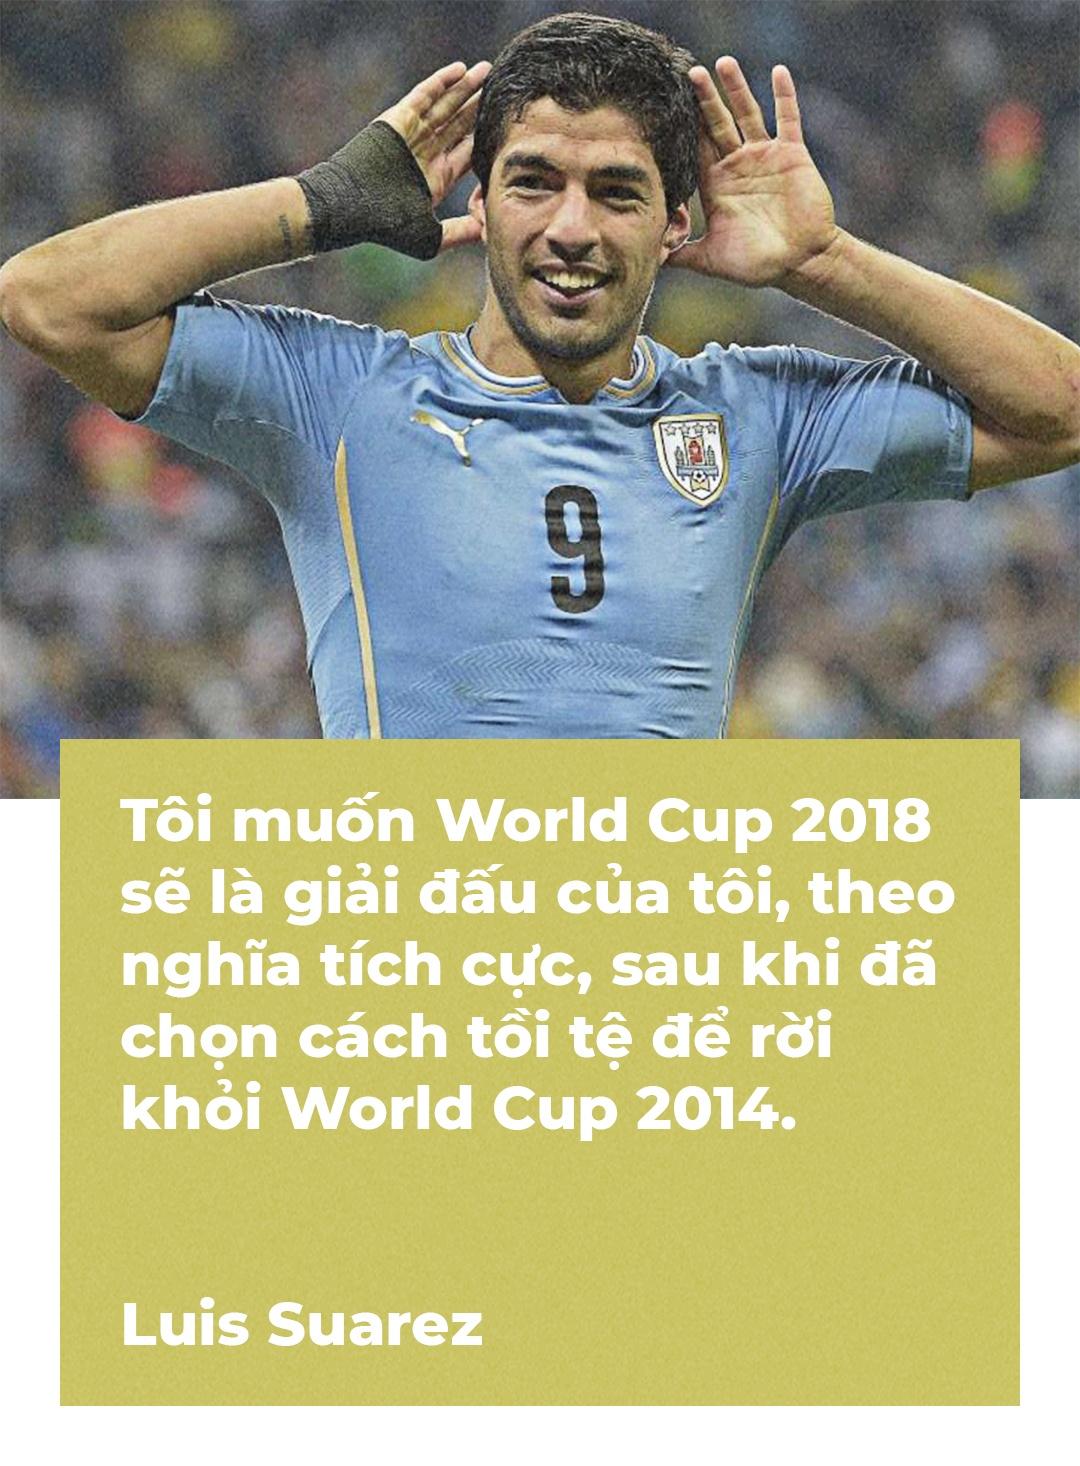 Bo mat nao cho Luis Suarez o World Cup 2018 anh 14